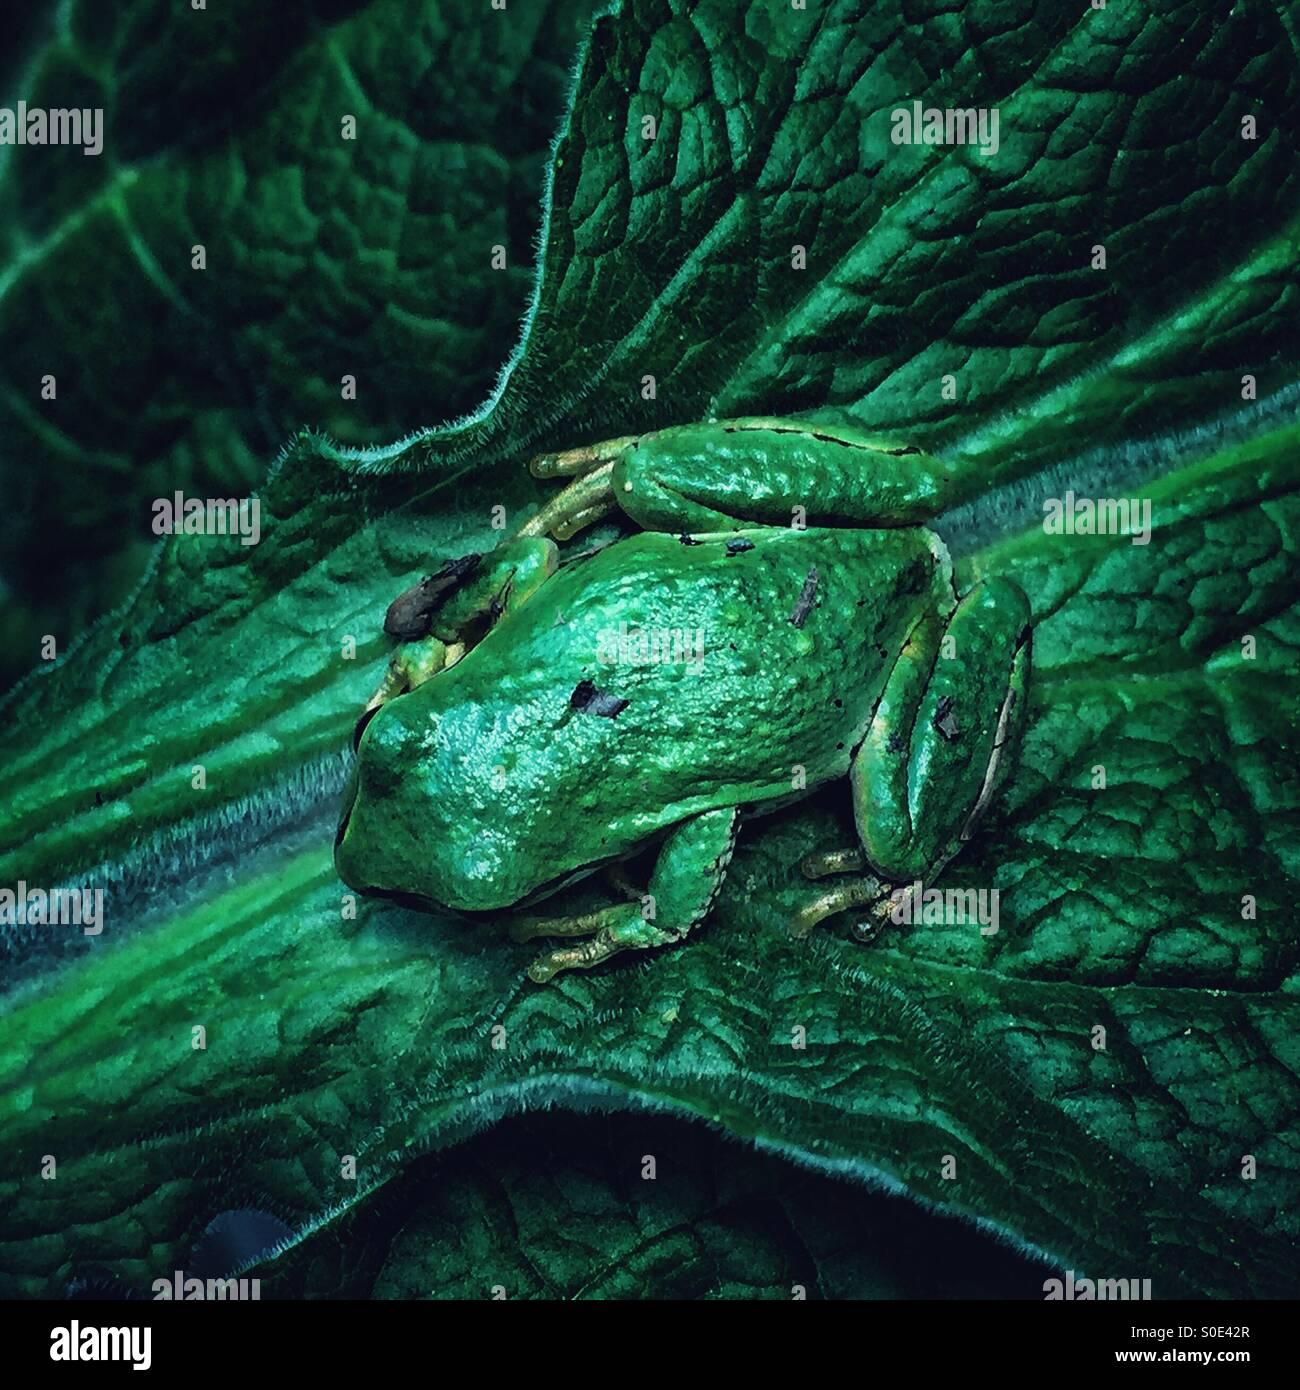 grüner Frosch auf grünes Blatt Stockbild